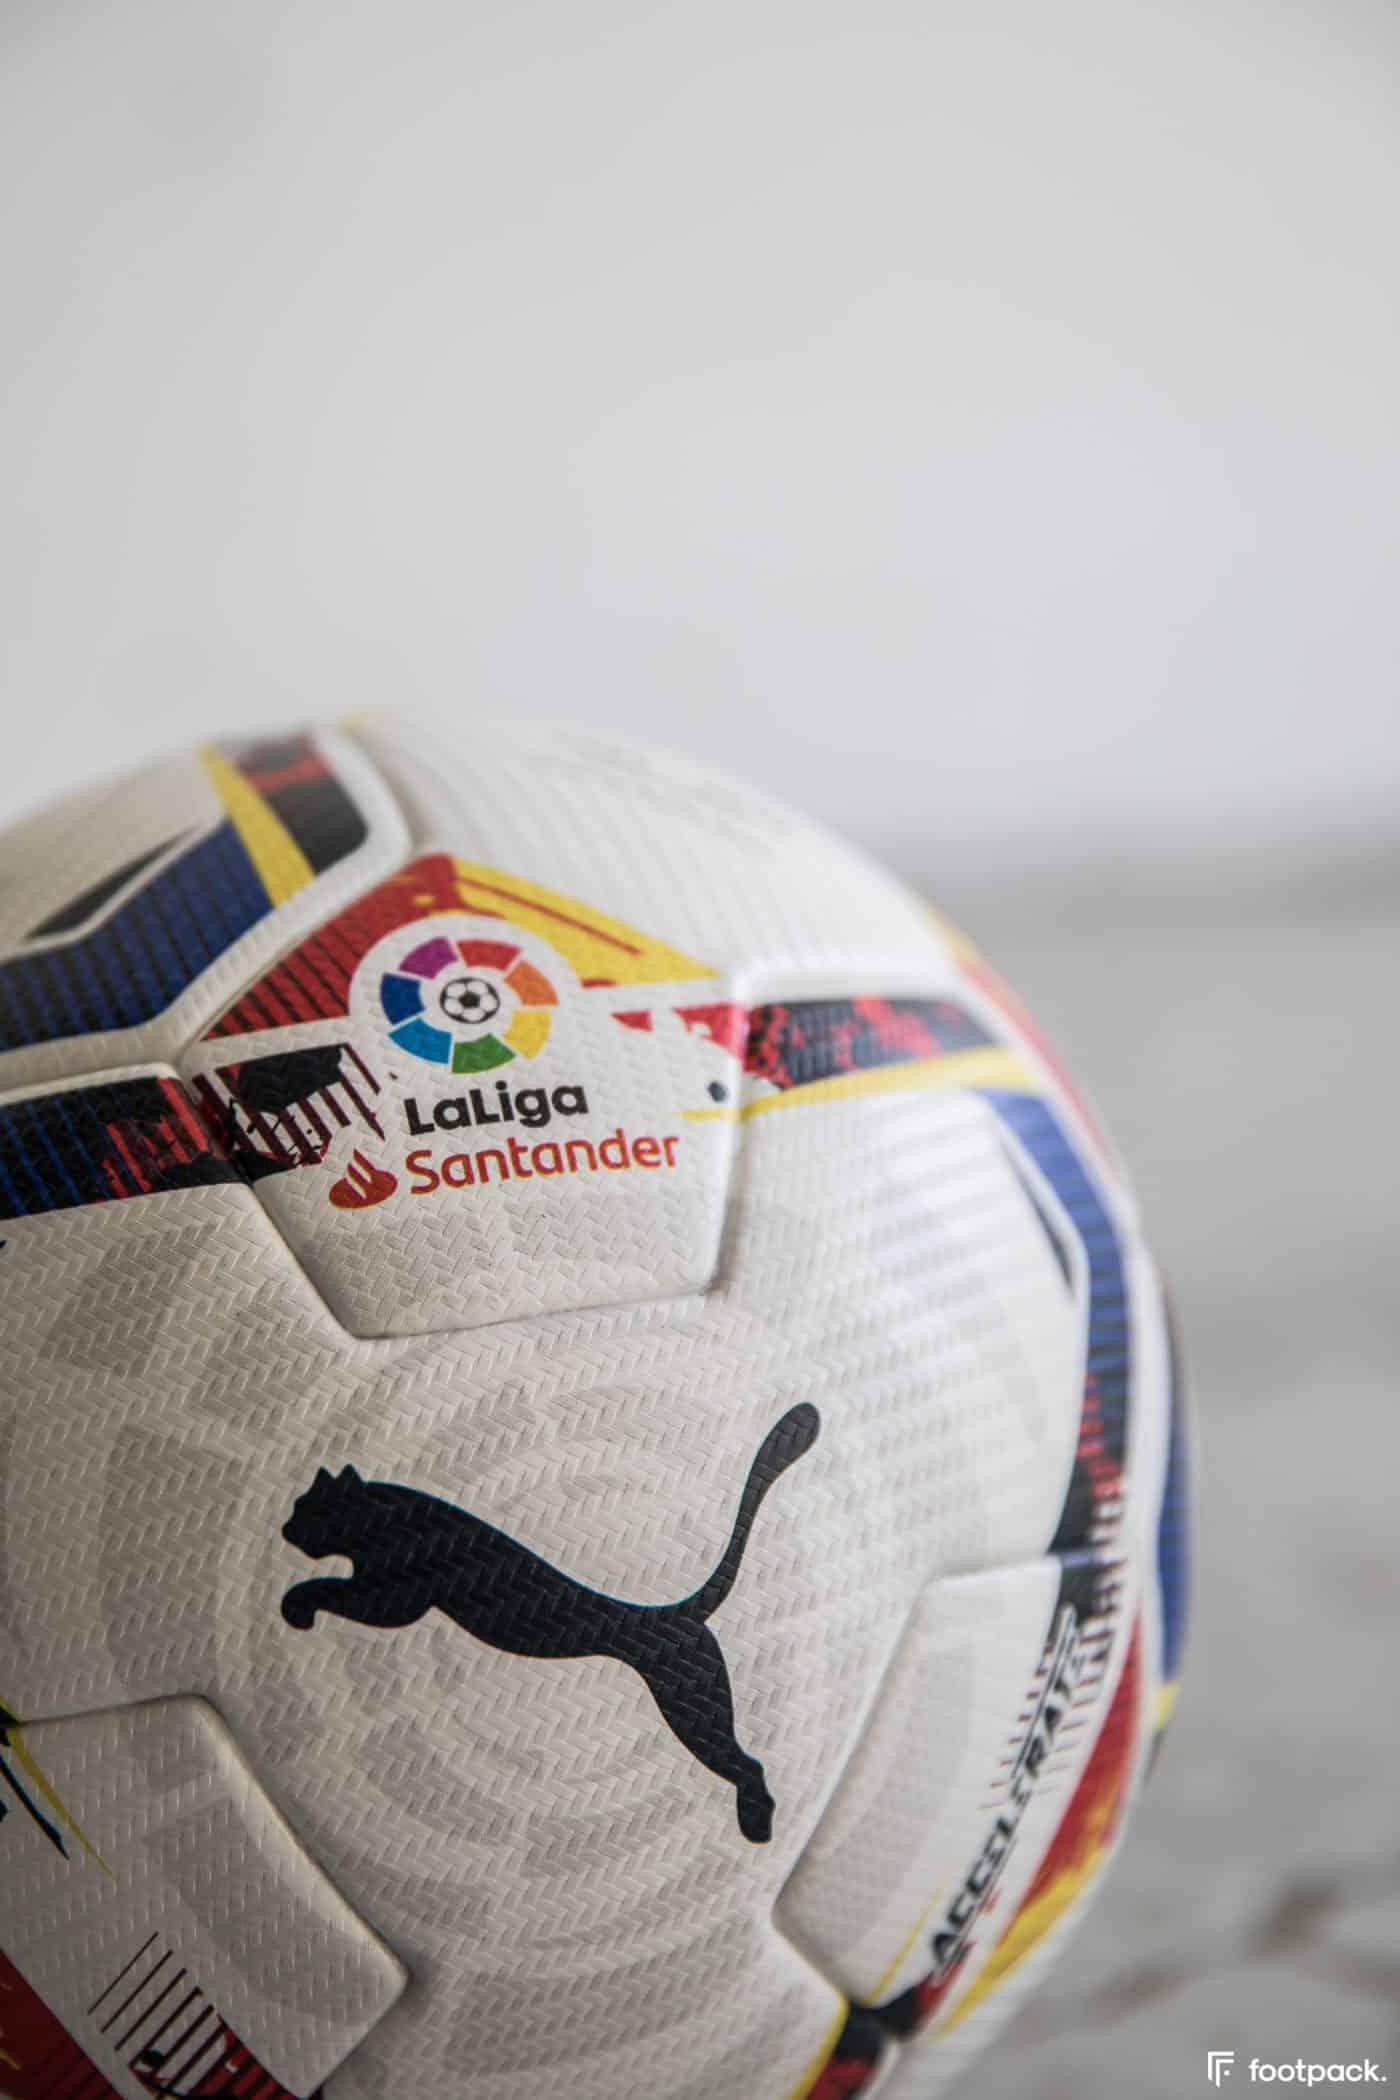 ballon-championnat-espagne-la-liga-2020-2021-puma-footpack-4